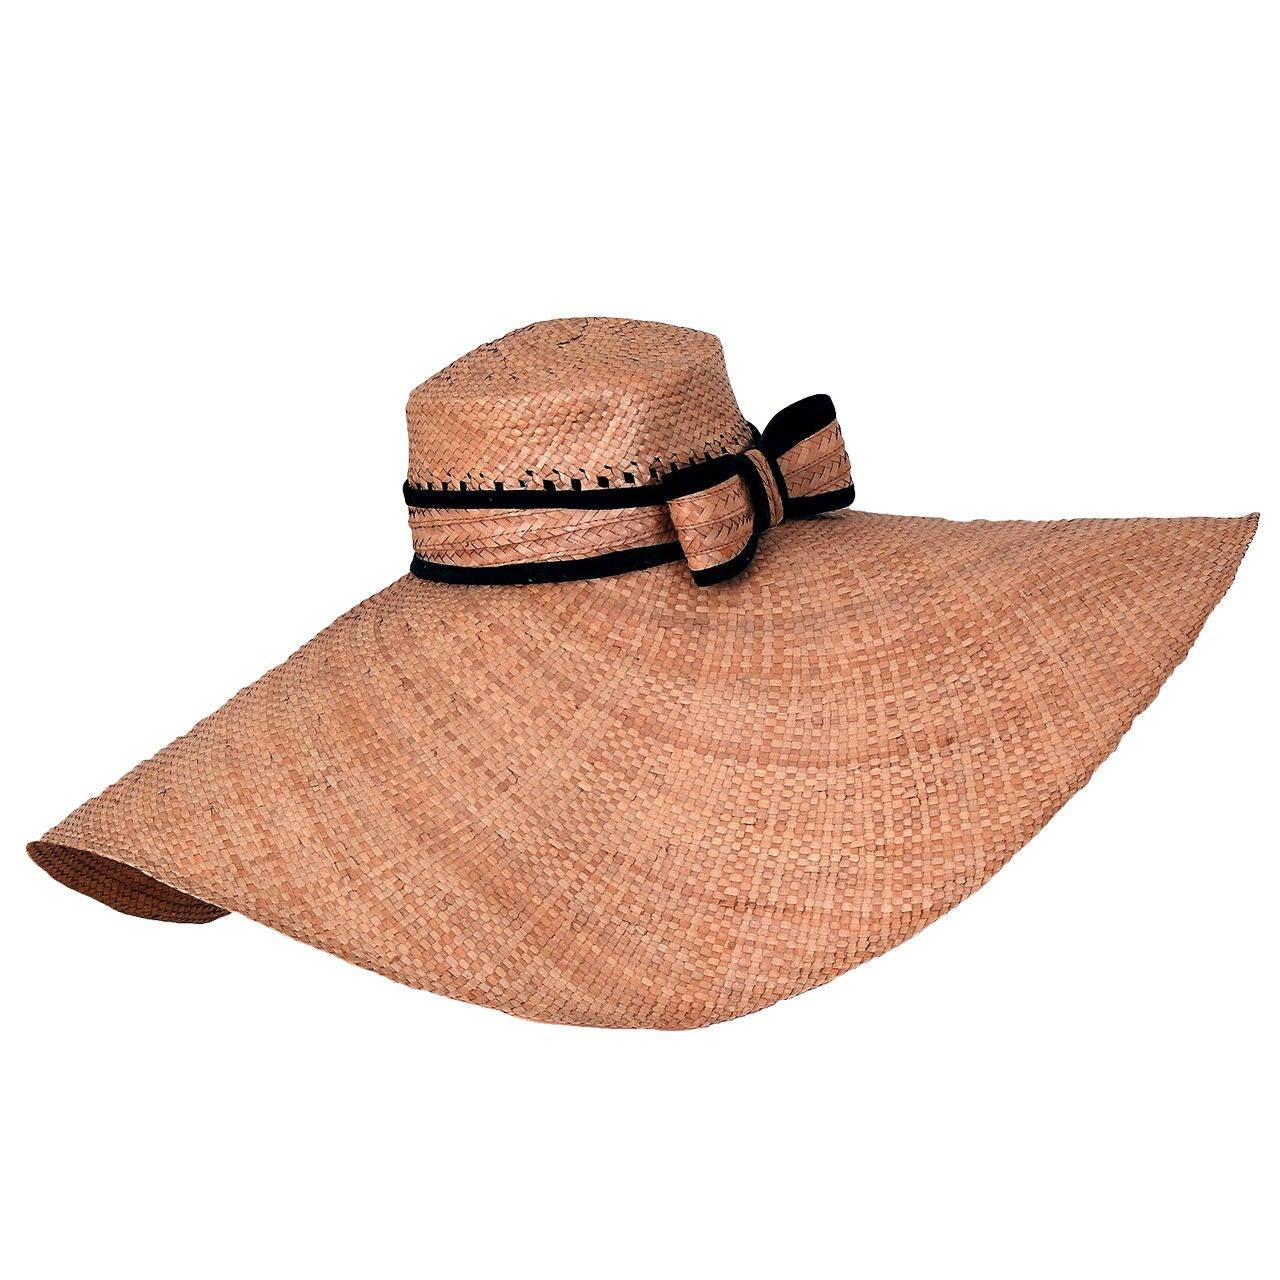 floppy beach hats - photo #24